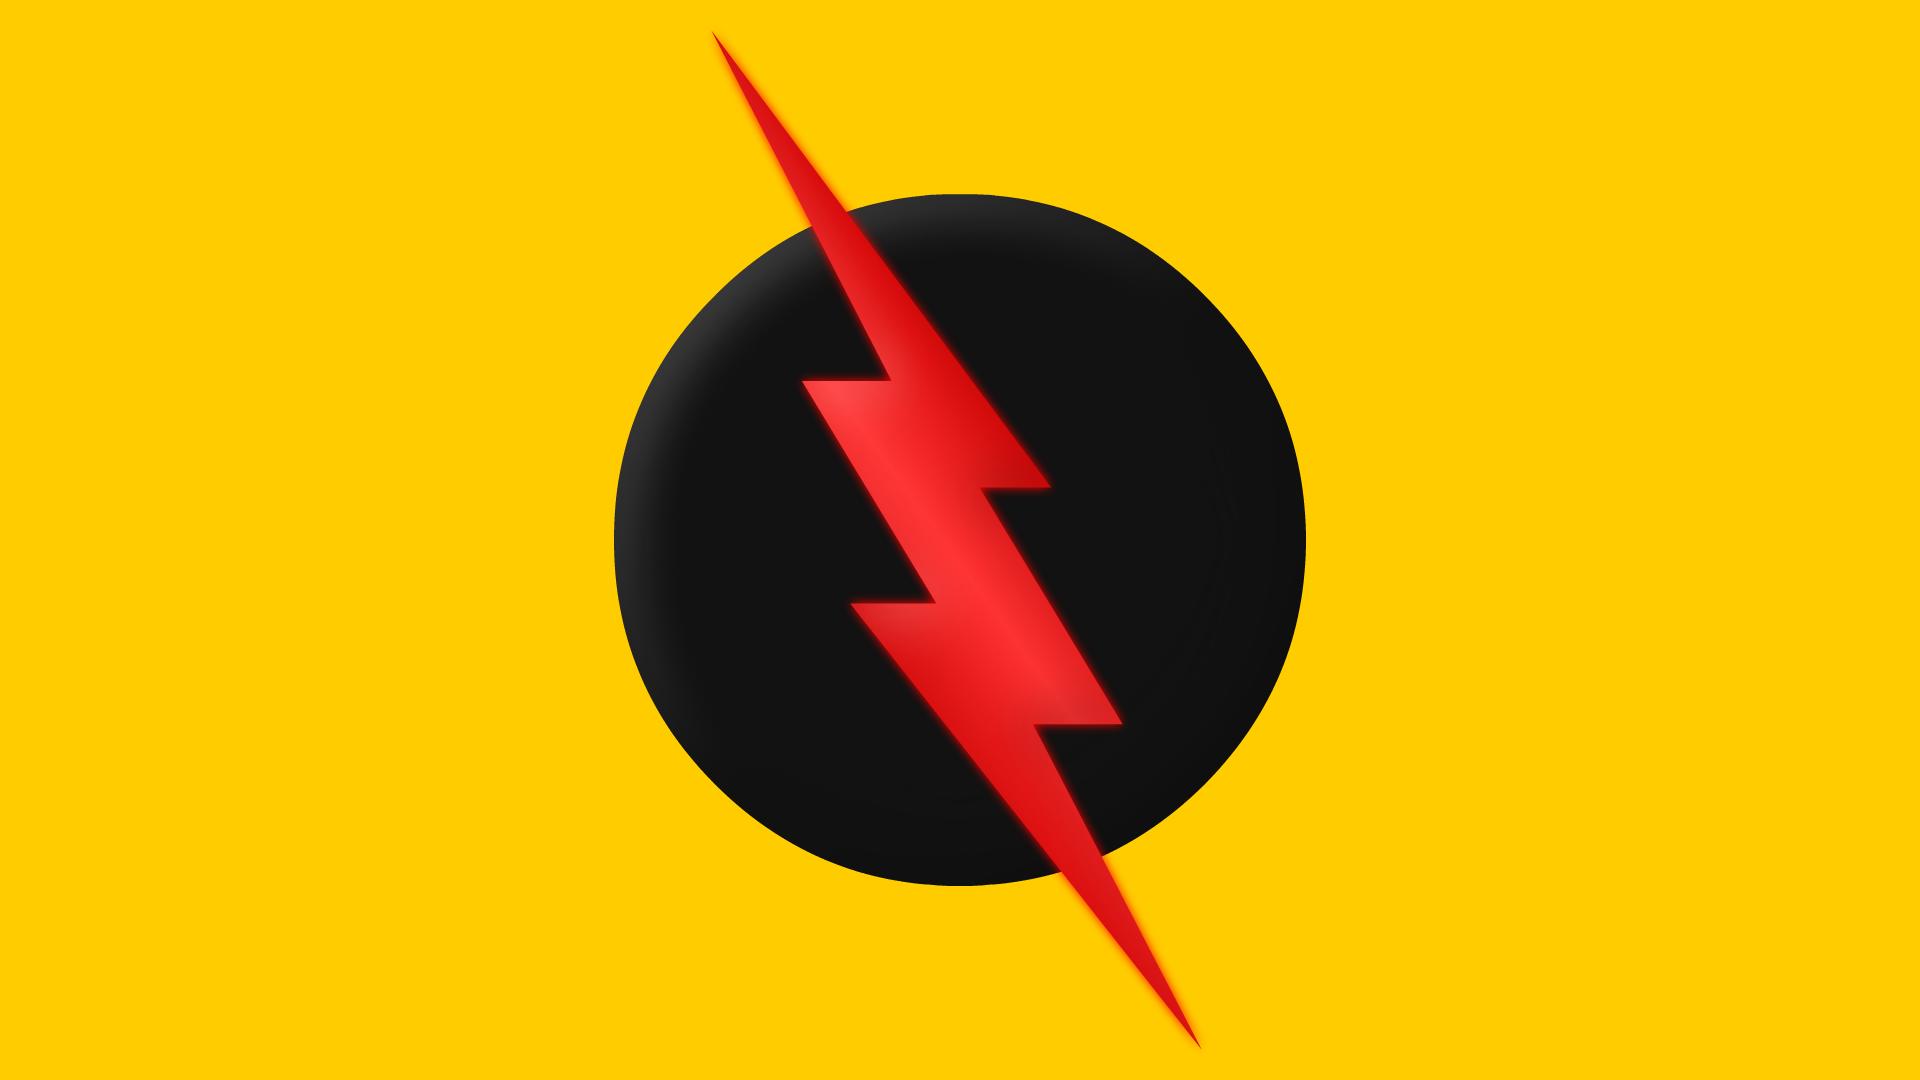 reverse flash symbol by yurtigo on deviantart. Black Bedroom Furniture Sets. Home Design Ideas